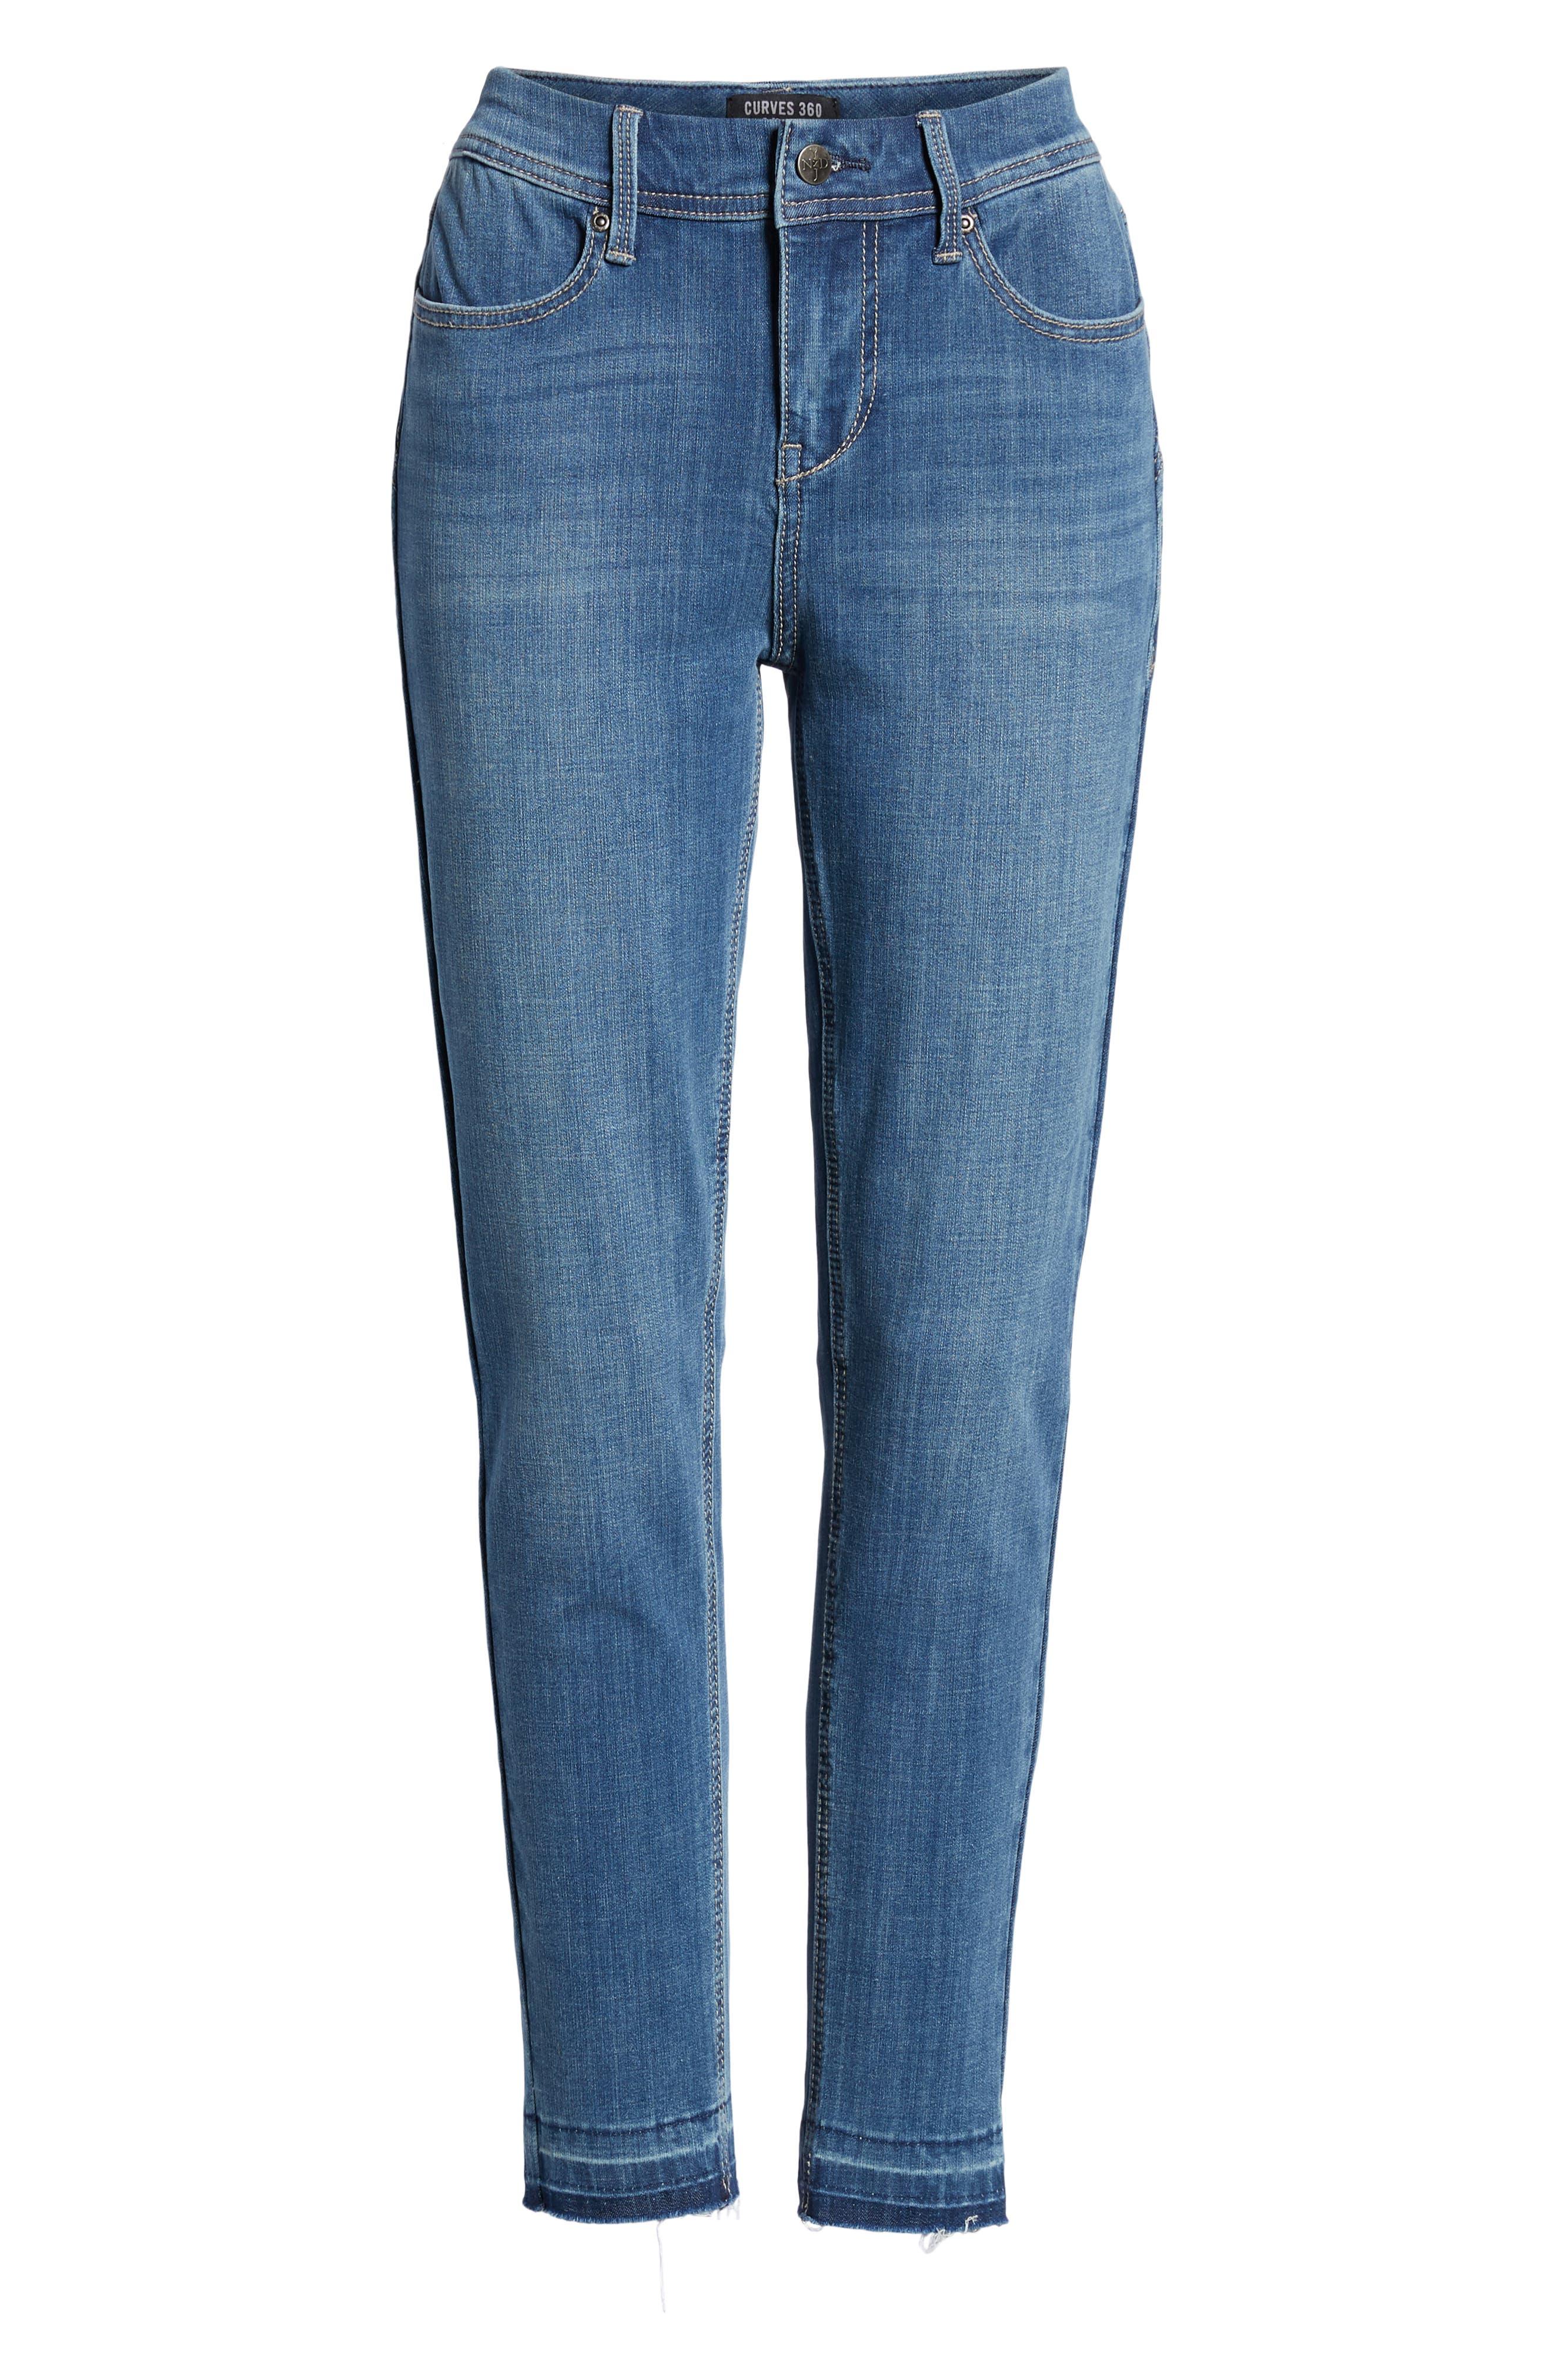 Release Hem Skinny Jeans,                             Alternate thumbnail 6, color,                             LEAR